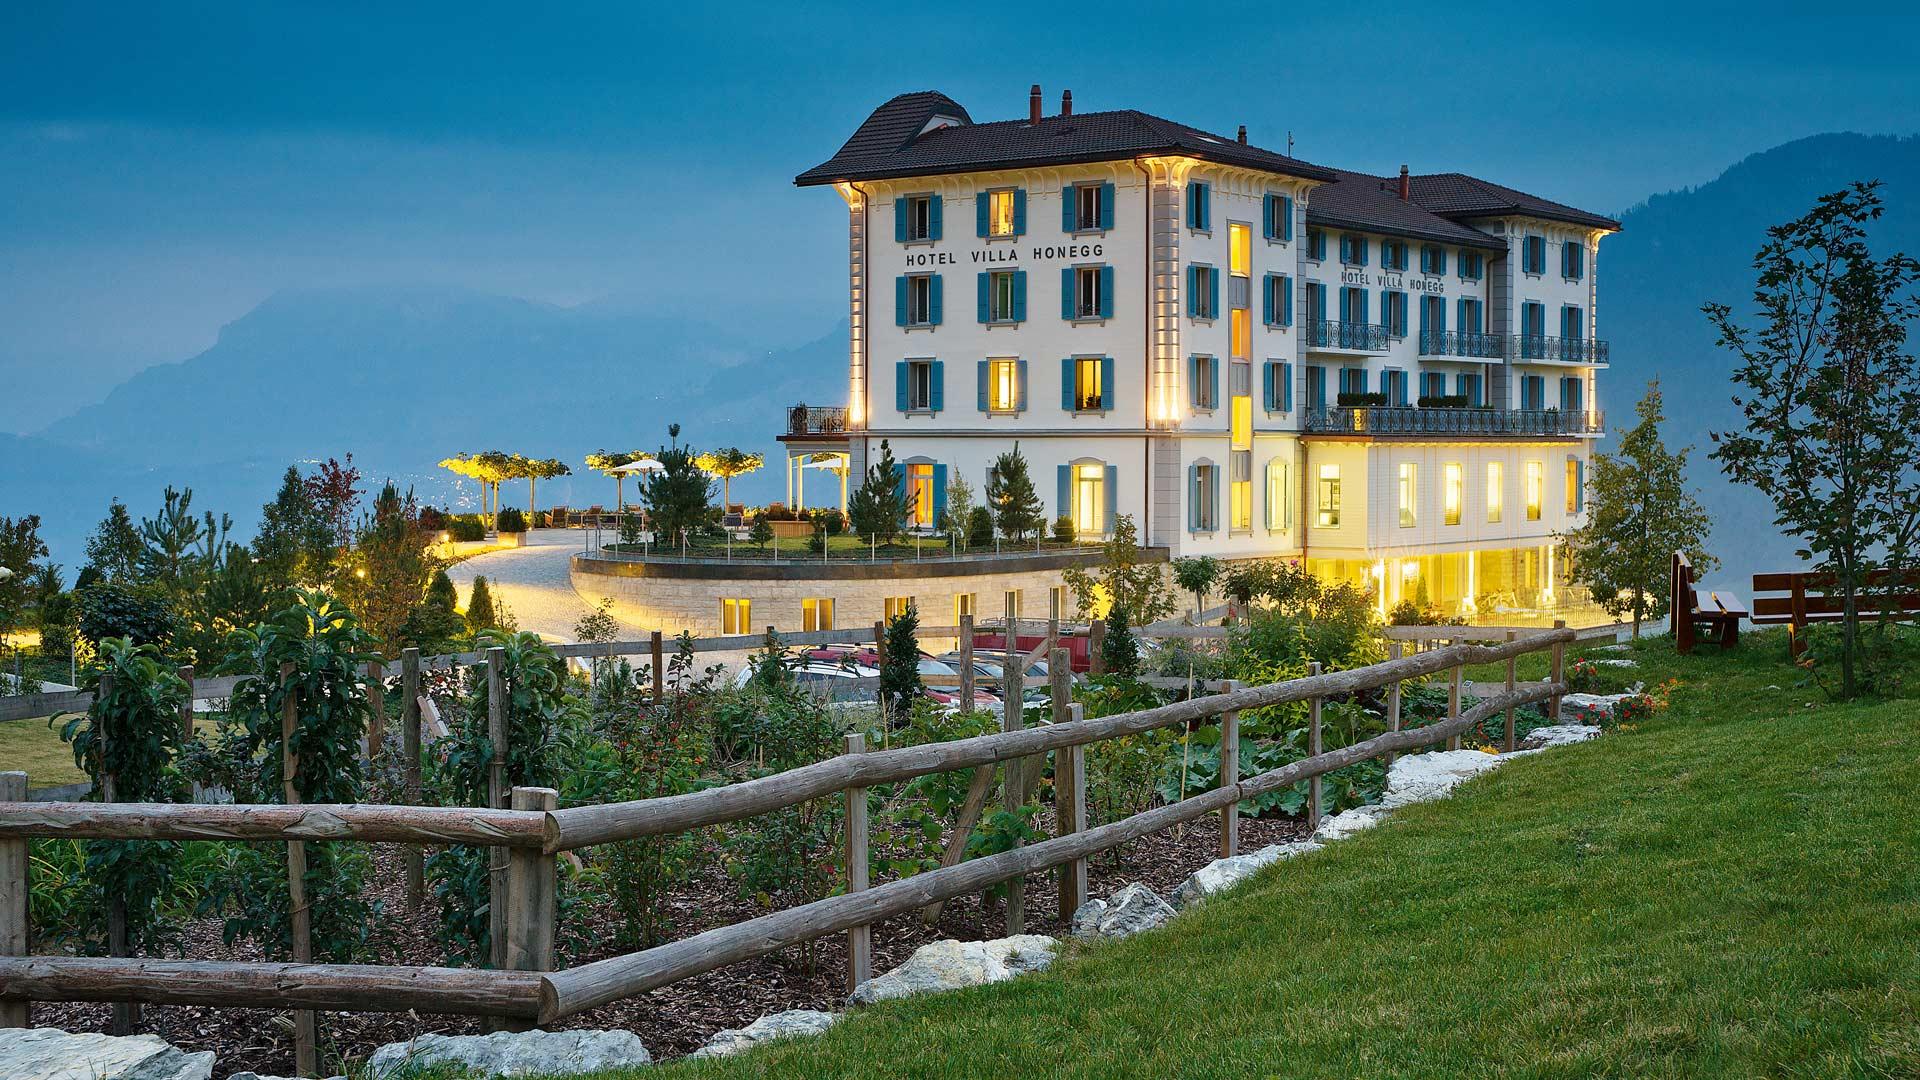 Hotel Villa Honegg destiné hideaways hotels